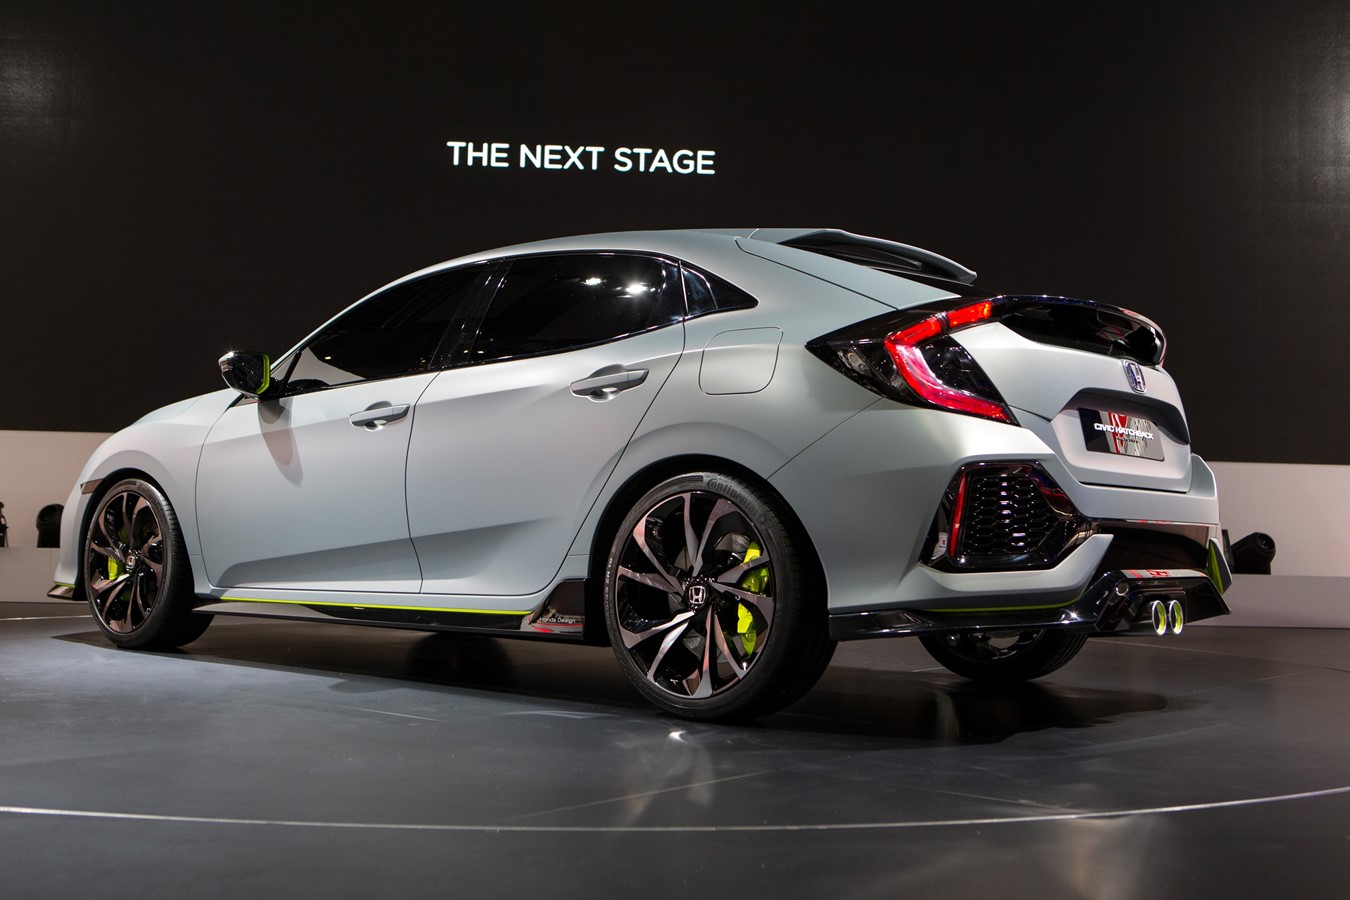 Honda Civic Hatchback Prototype at Geneva Motor Show 2016